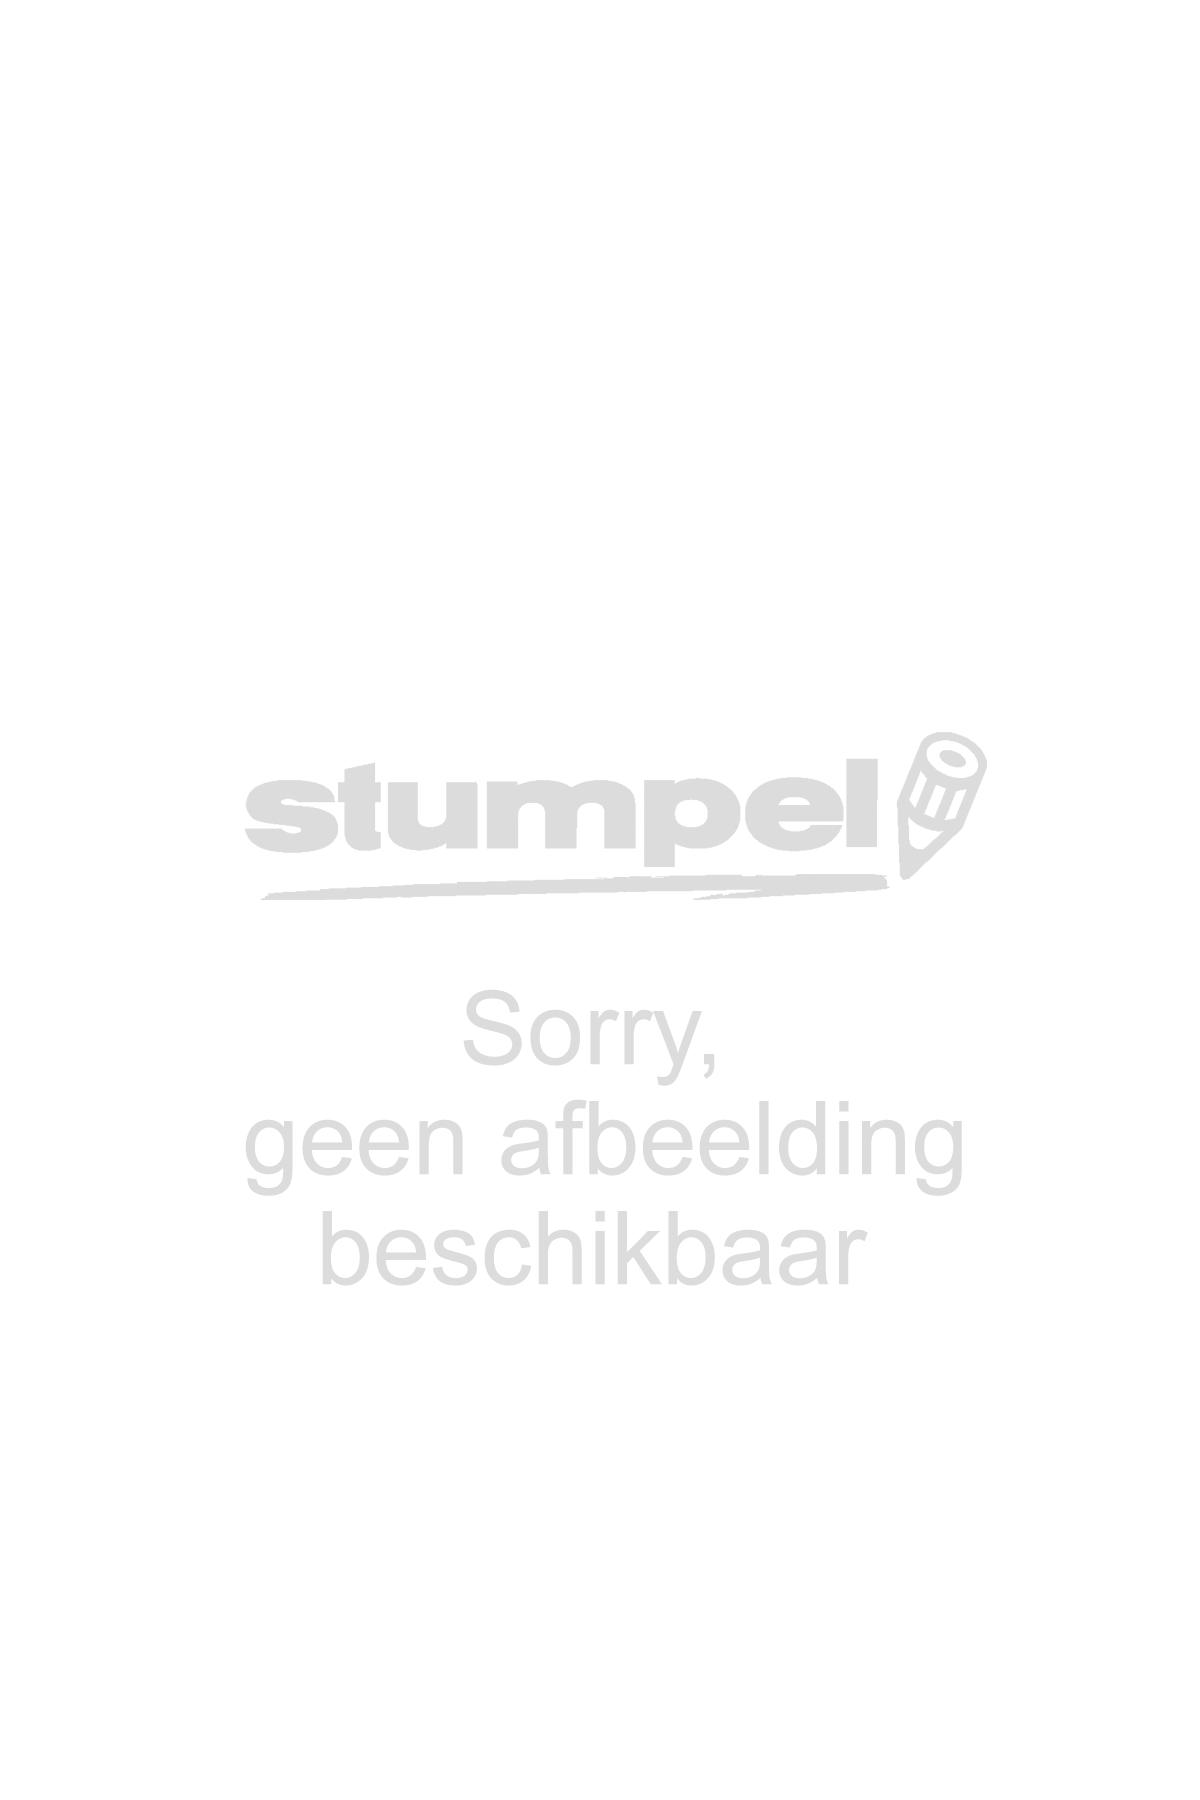 whiteboardstift-lega-tz-140-fine-zwart-drg-uitwisb-920321